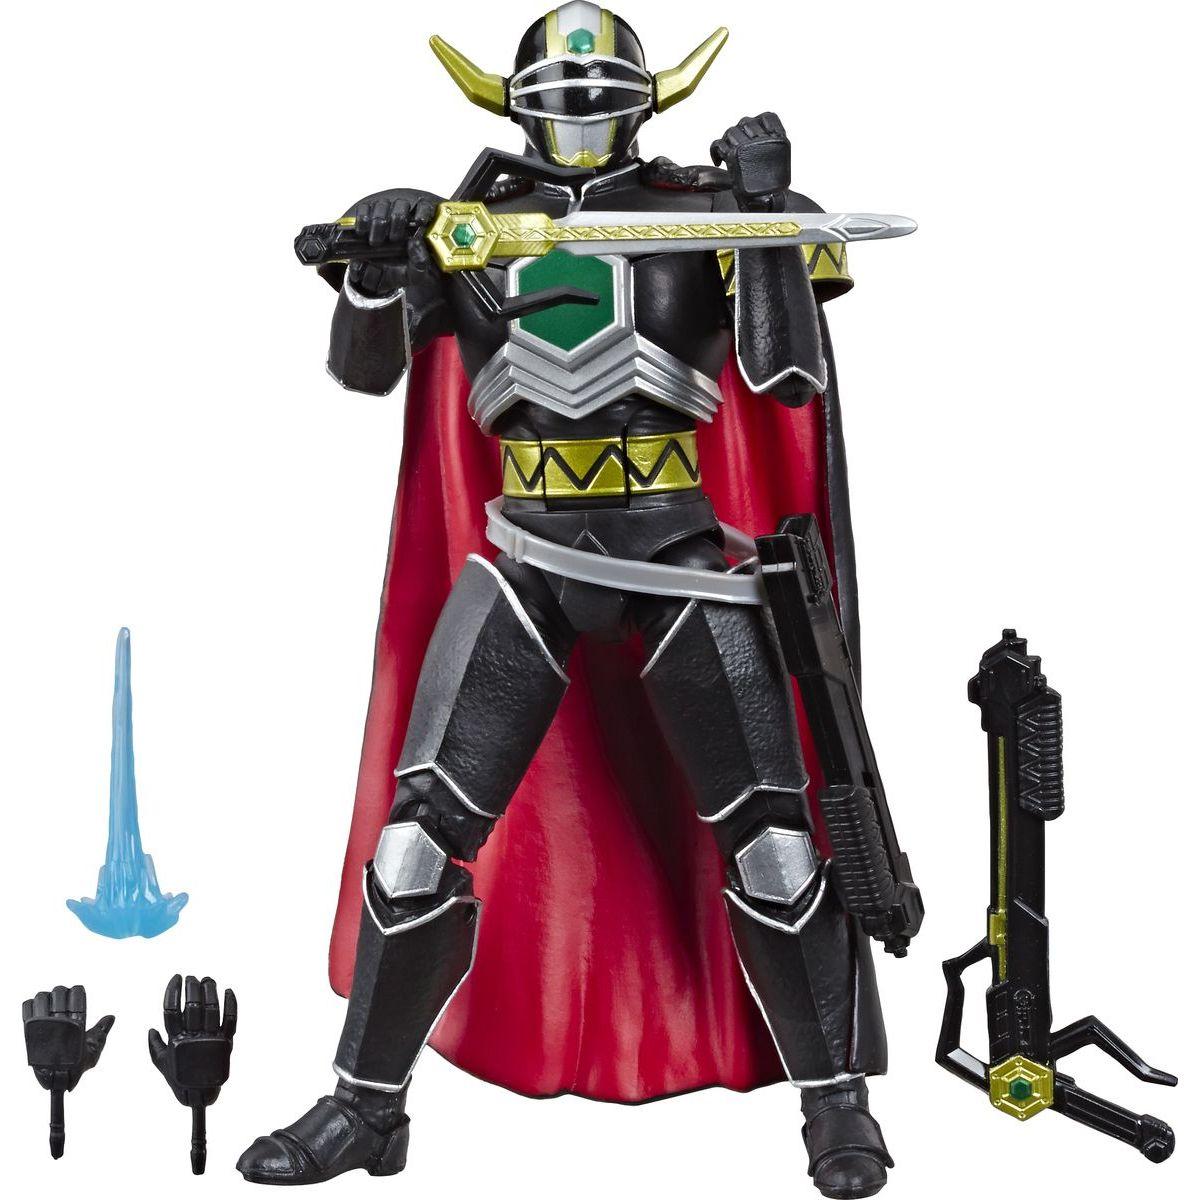 Hasbro Power Rangers 15 cm figurka s výměnnou hlavou Lost Galaxy Magna Defender HASBRO